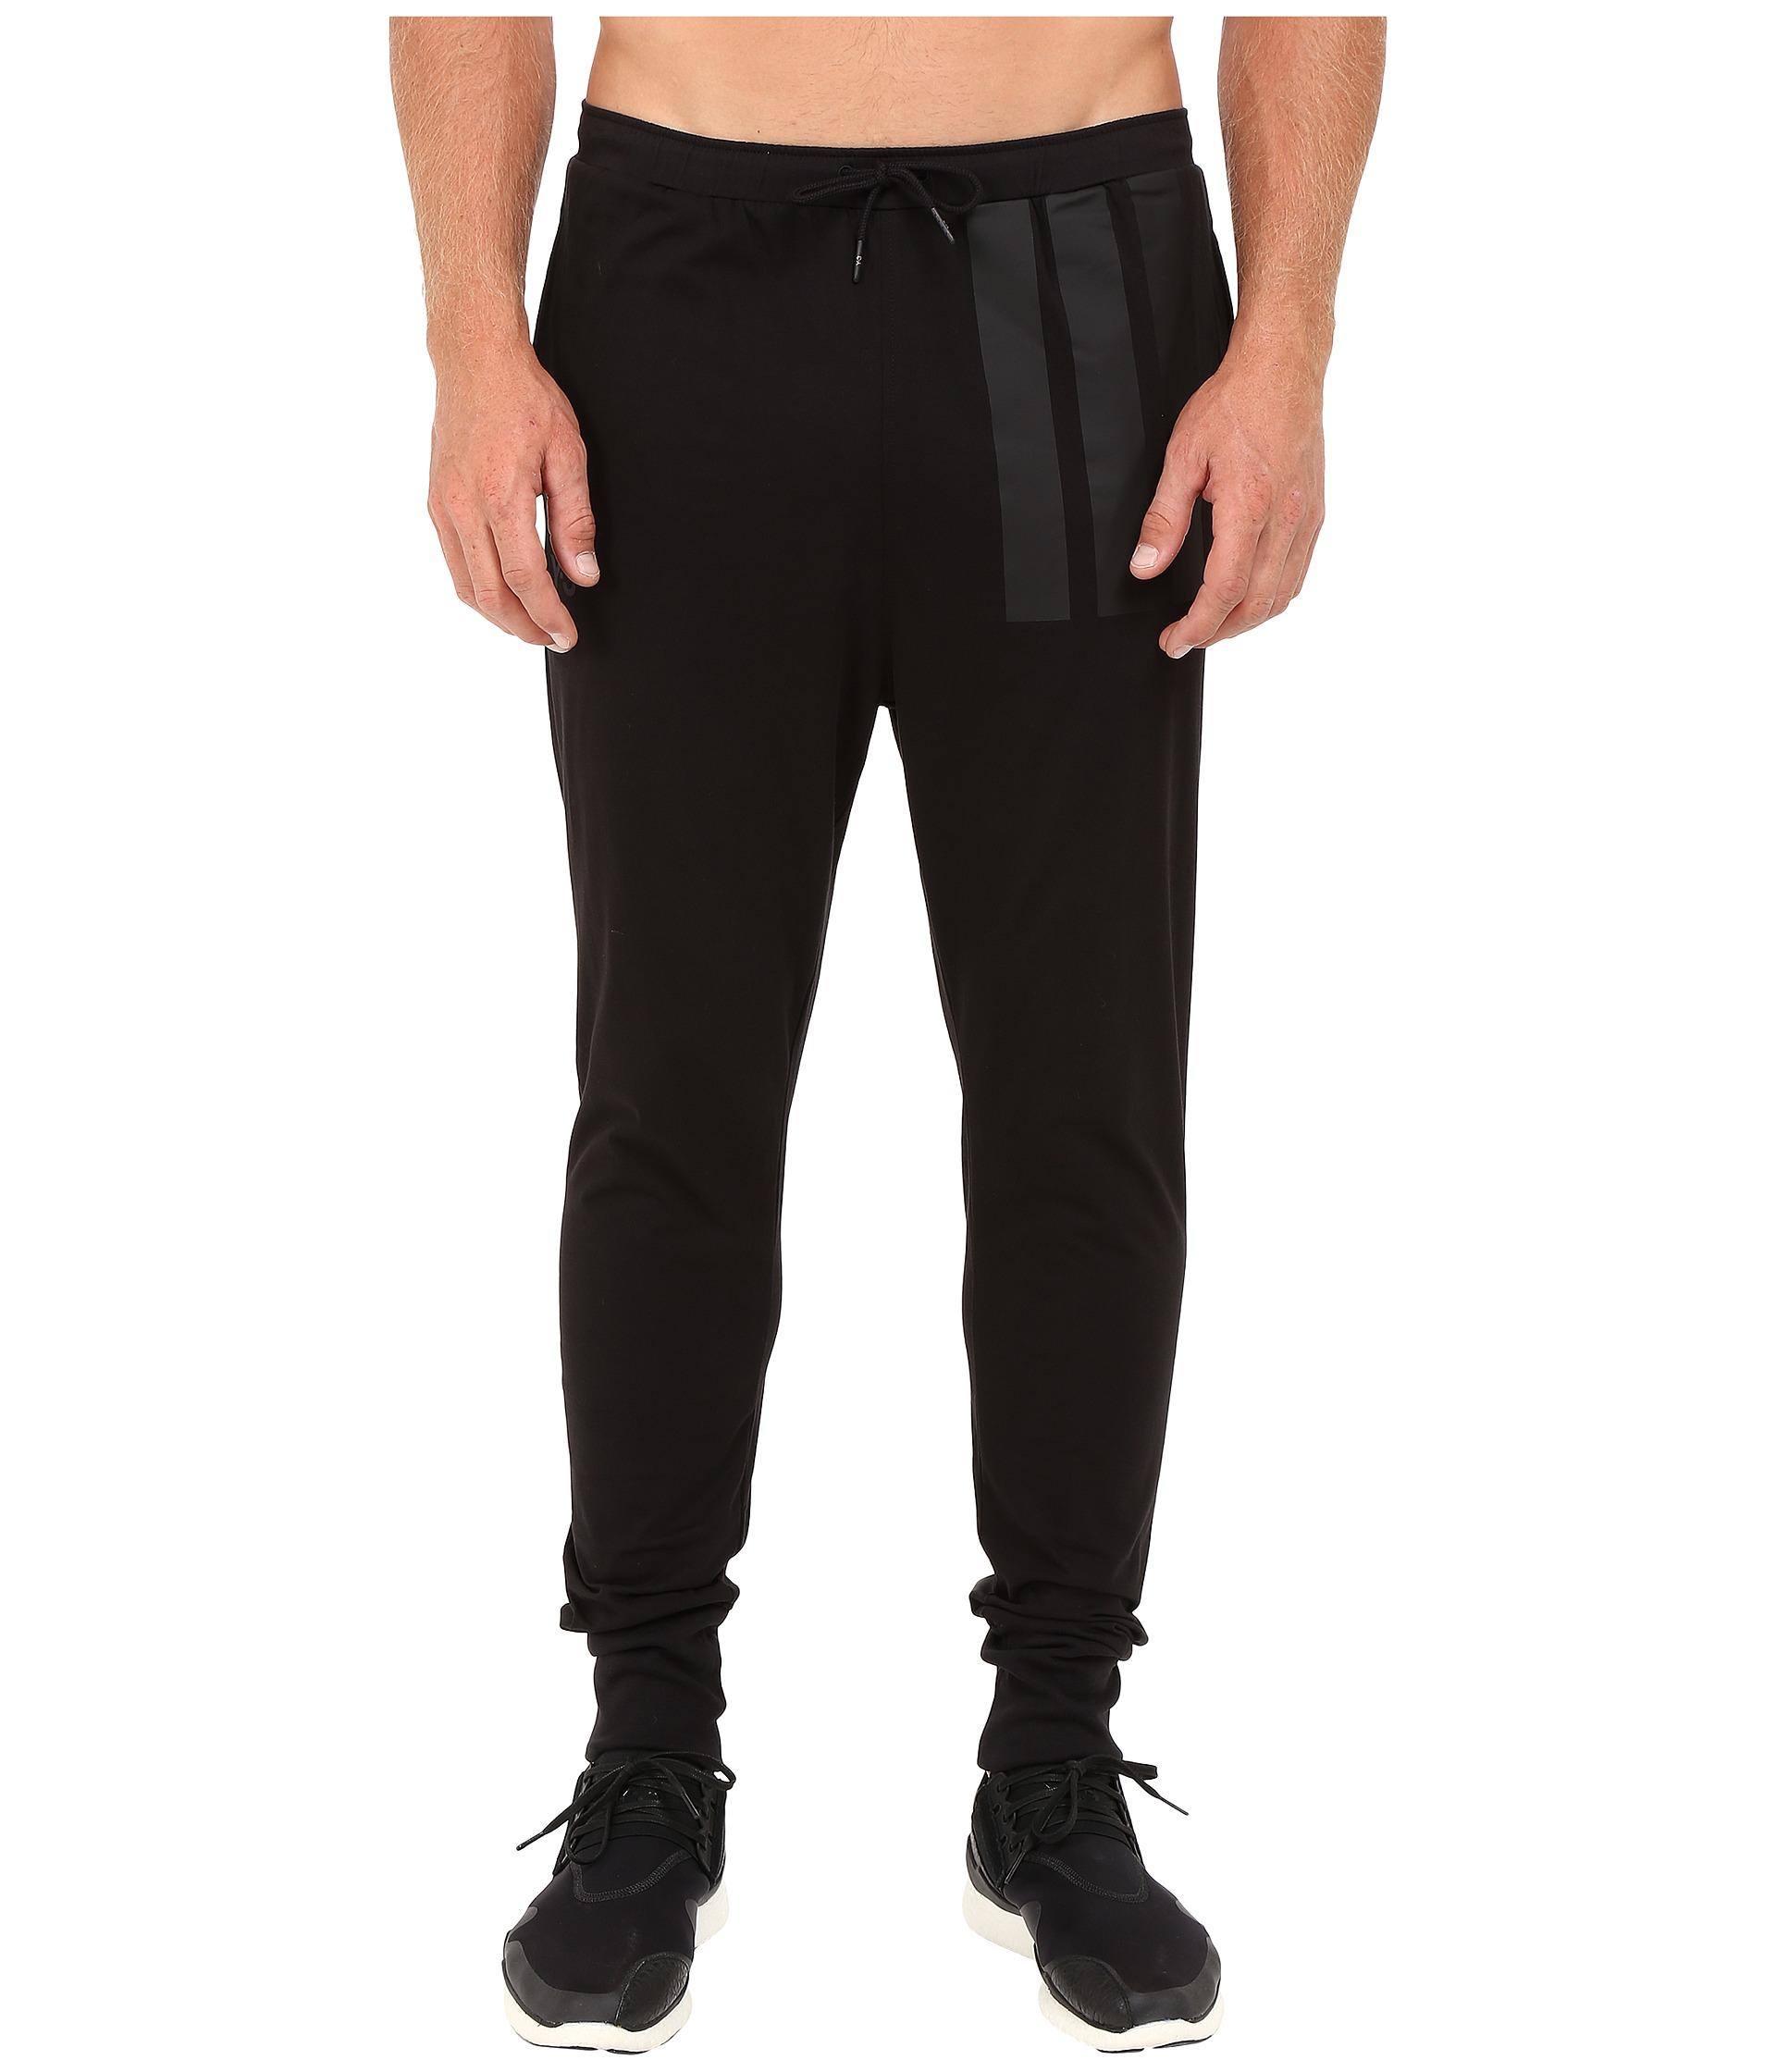 nike shox Saikano rose - Adidas Originals 3 Stripes Leggings | Shipped Free at Zappos